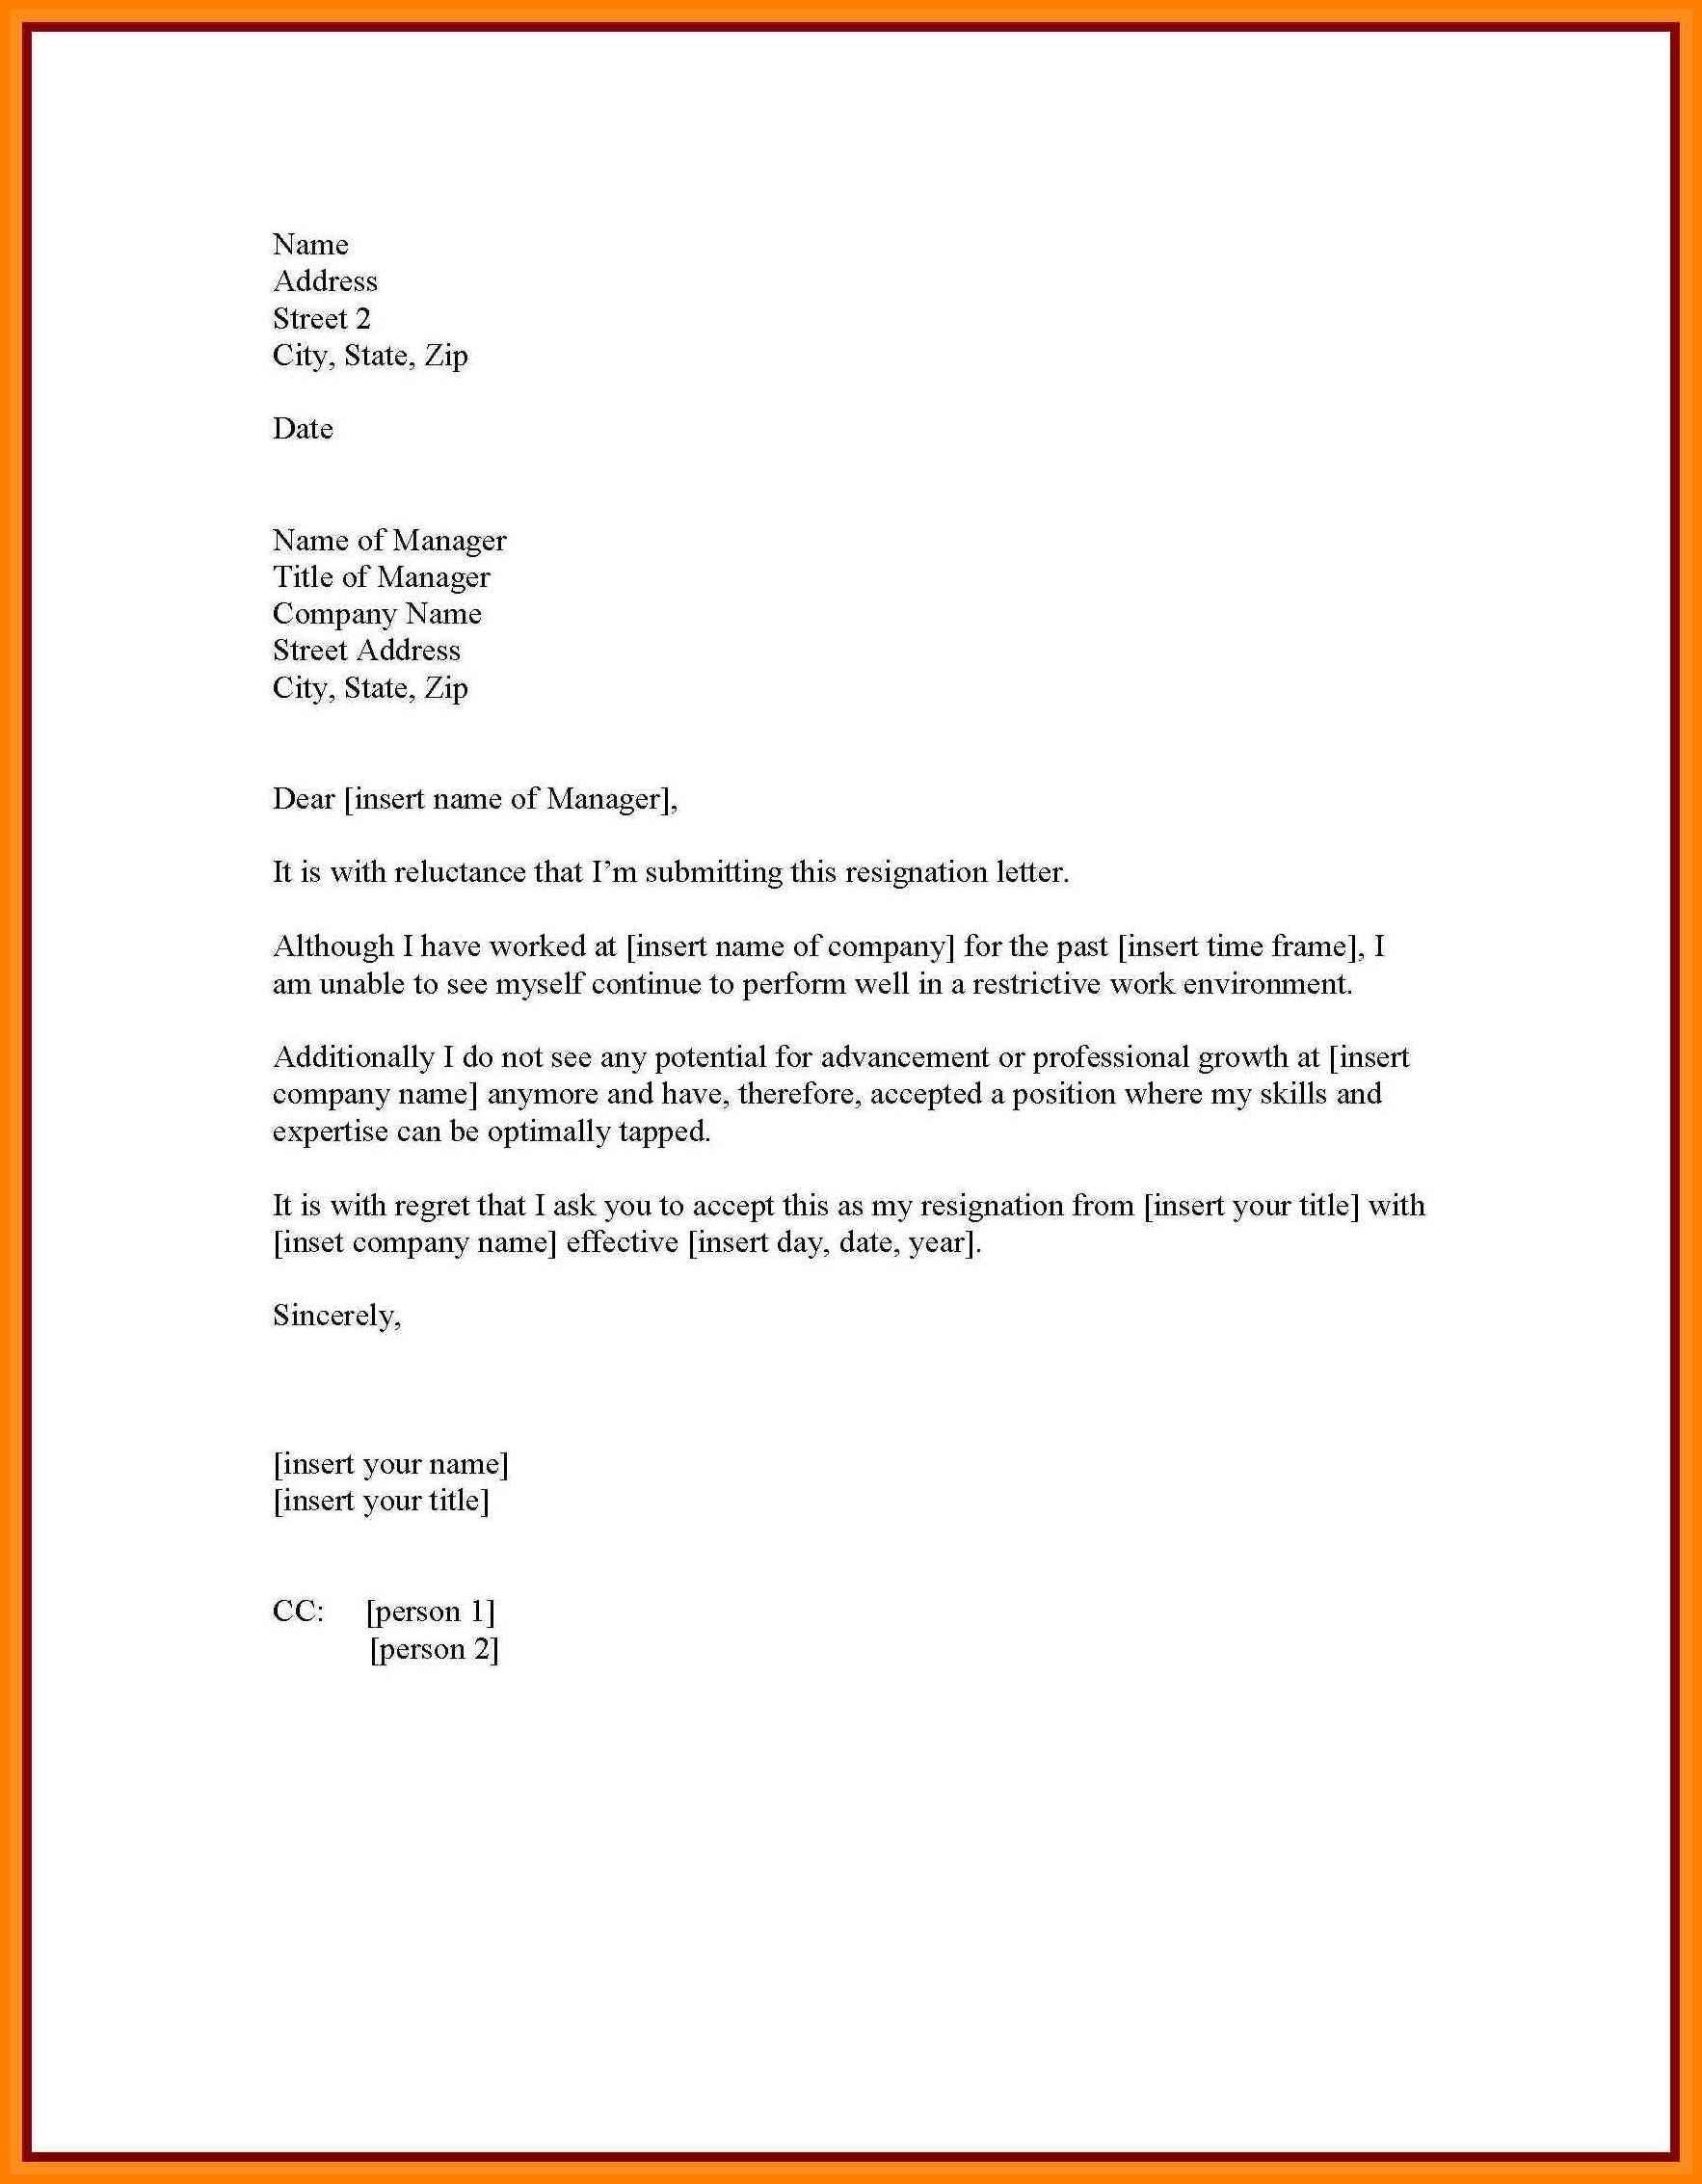 Resignation Letter Personal Reason Sample Resignation Letter Personal 6 Cover Letter